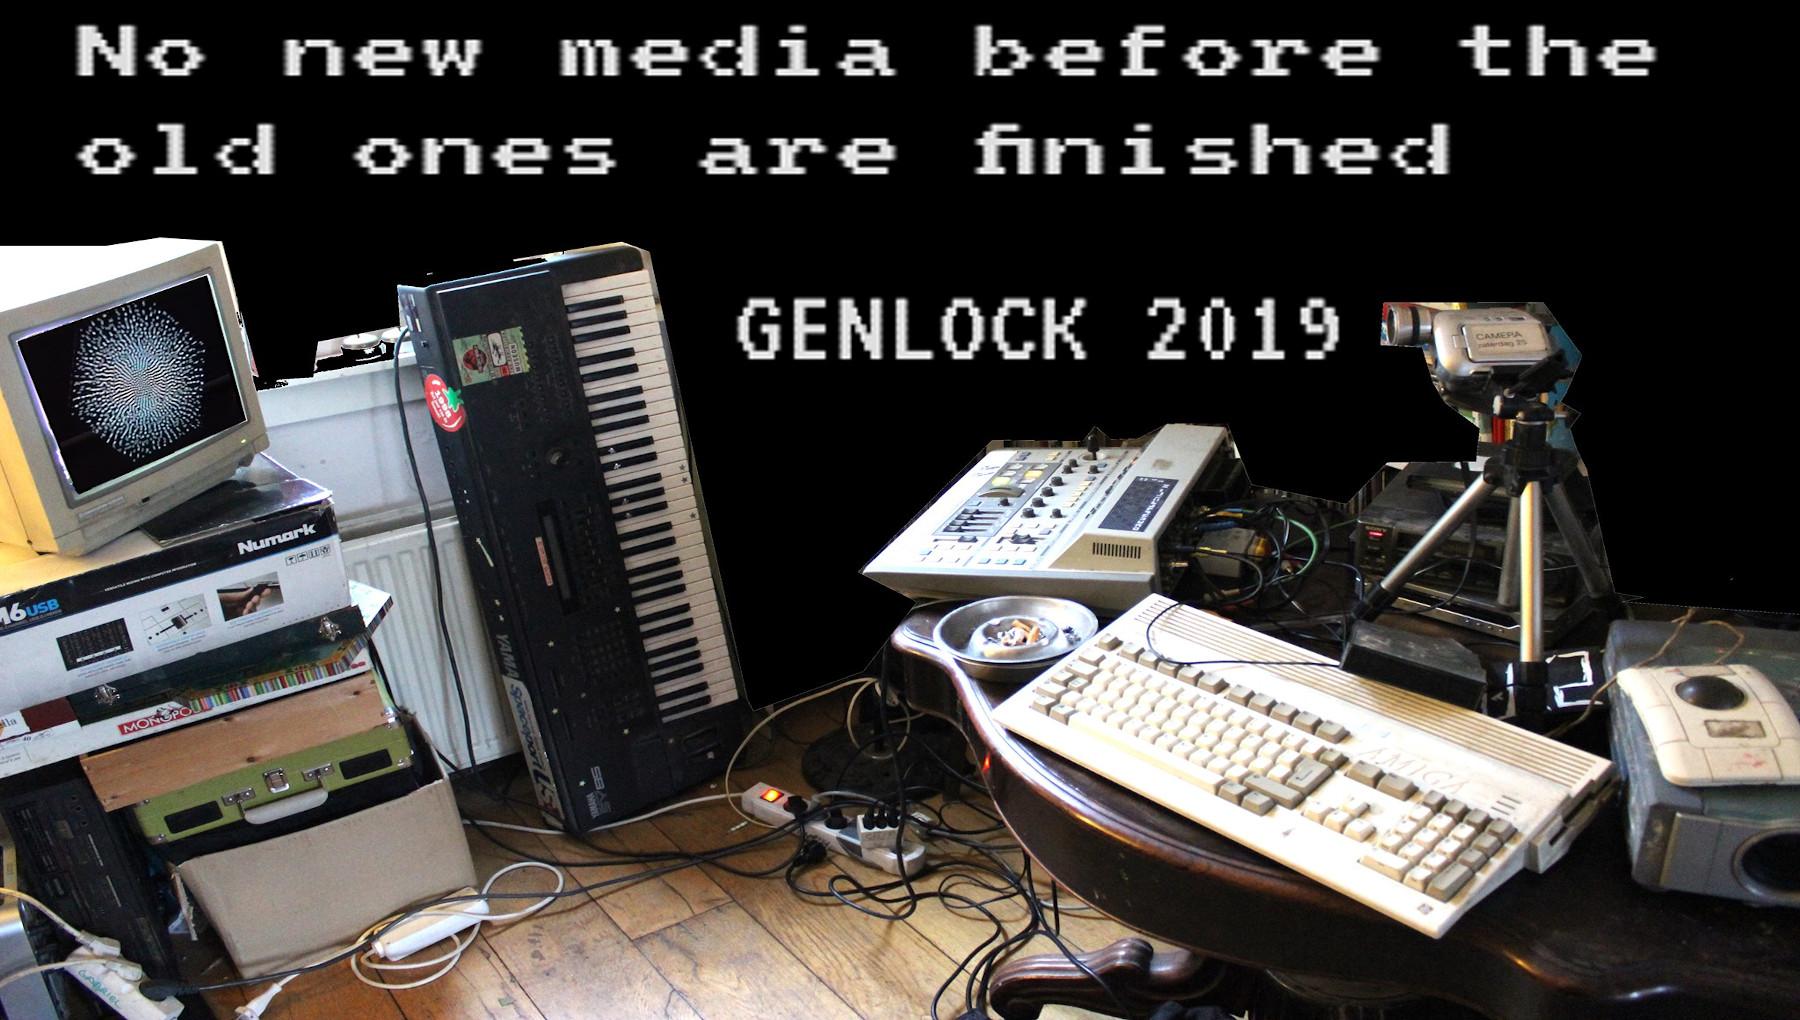 Genlock 2019 2#